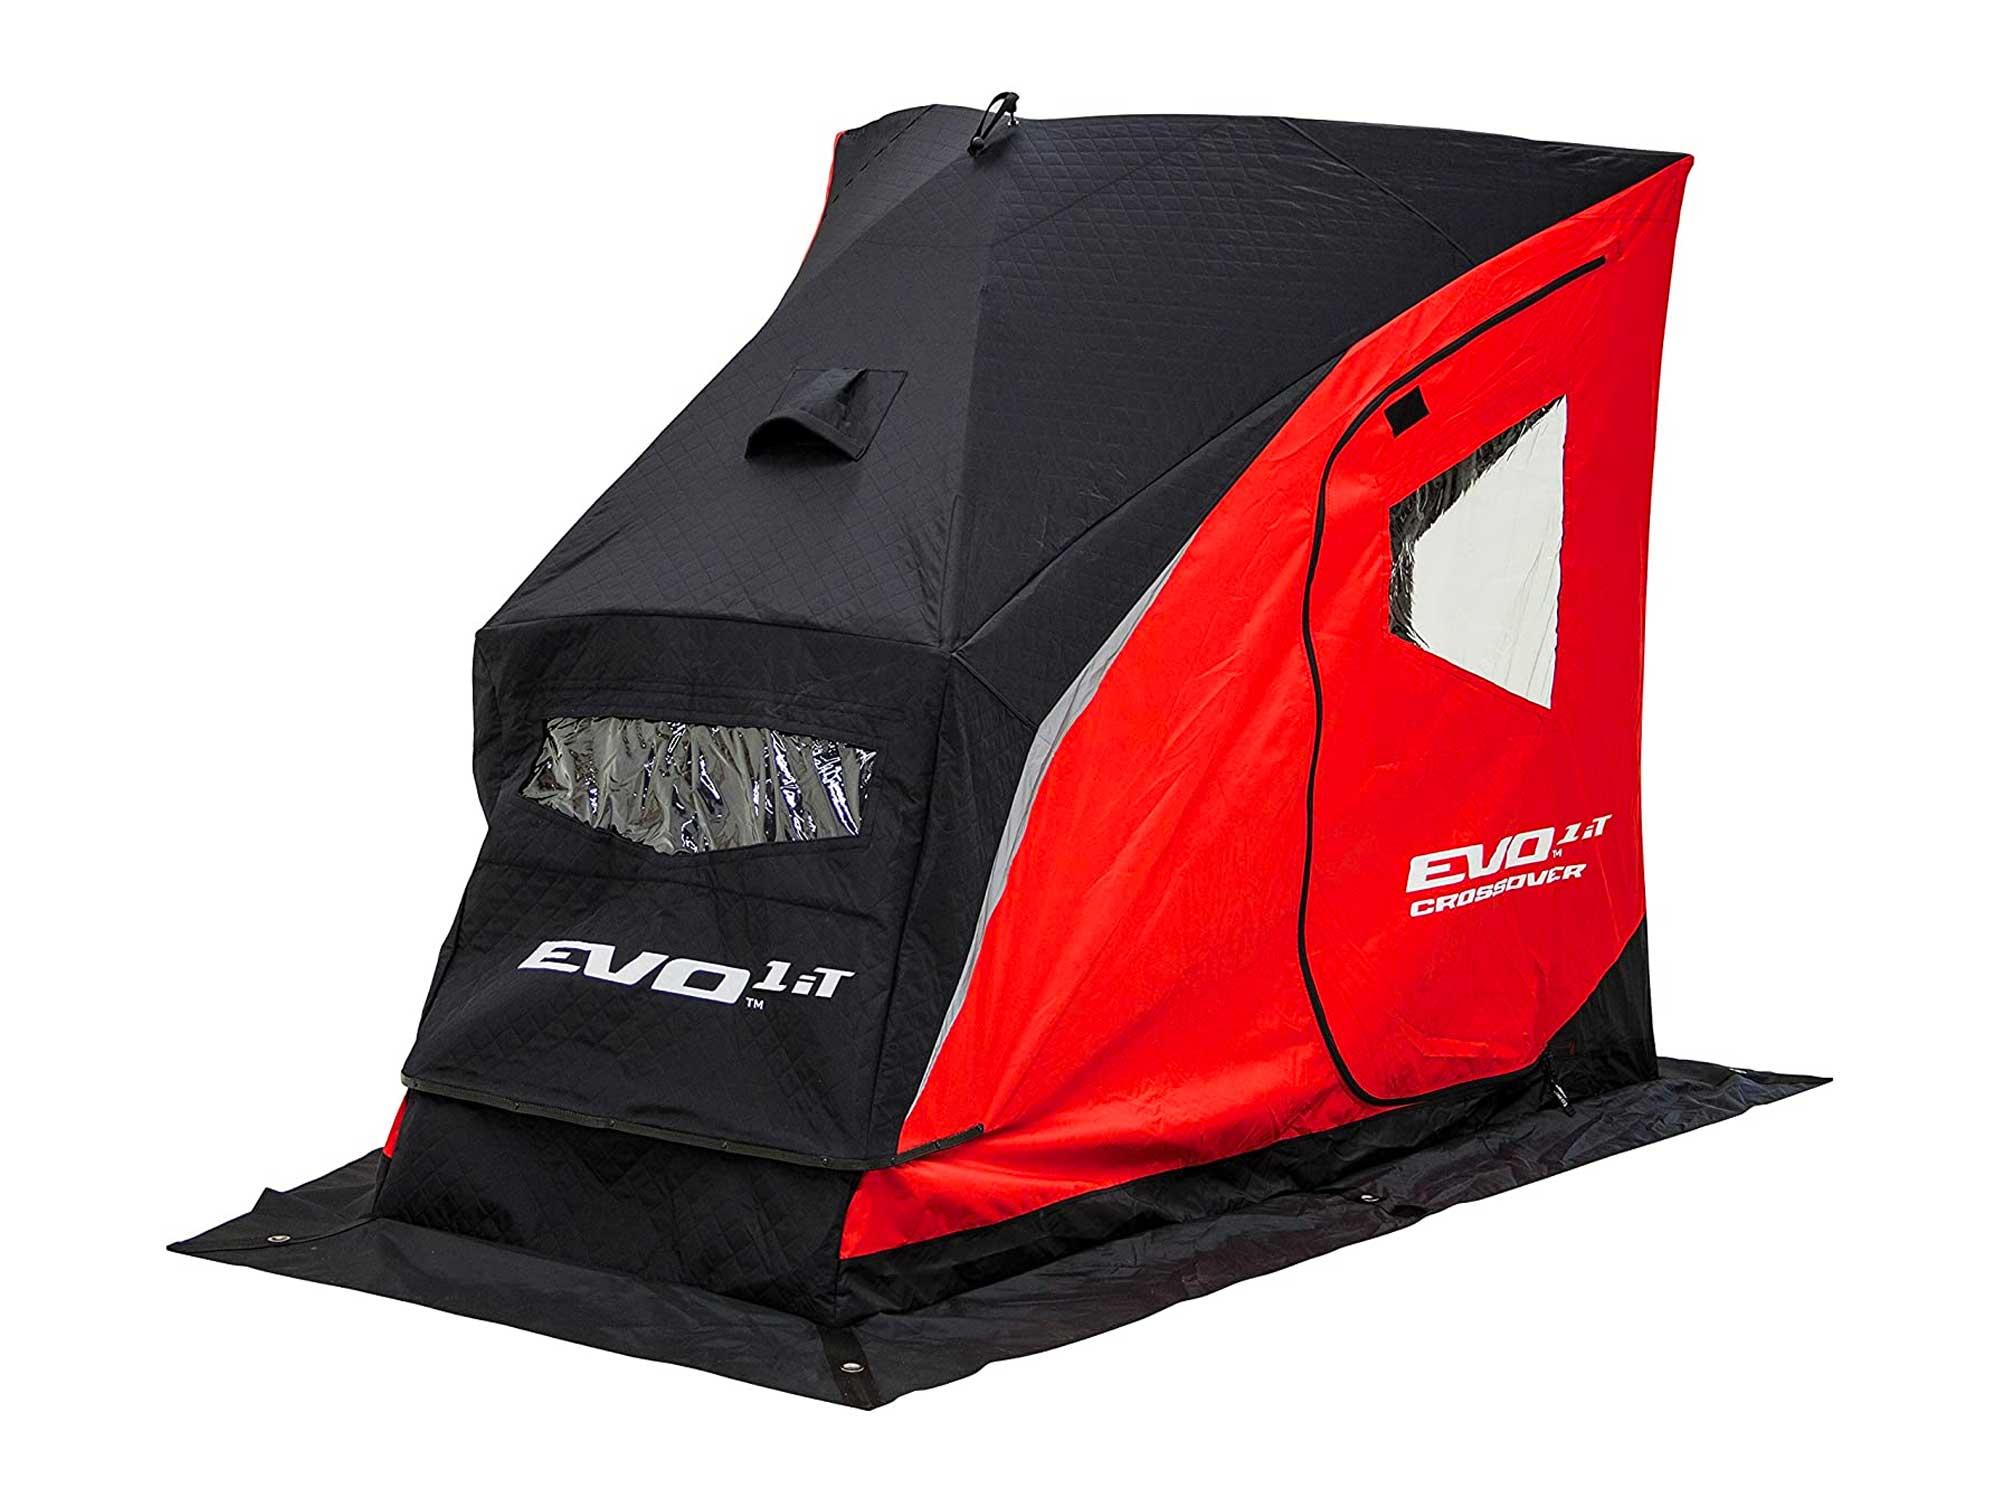 Eskimo Evo Series Portable Flip Style Ice Shelter with Pop Up Hub Sides